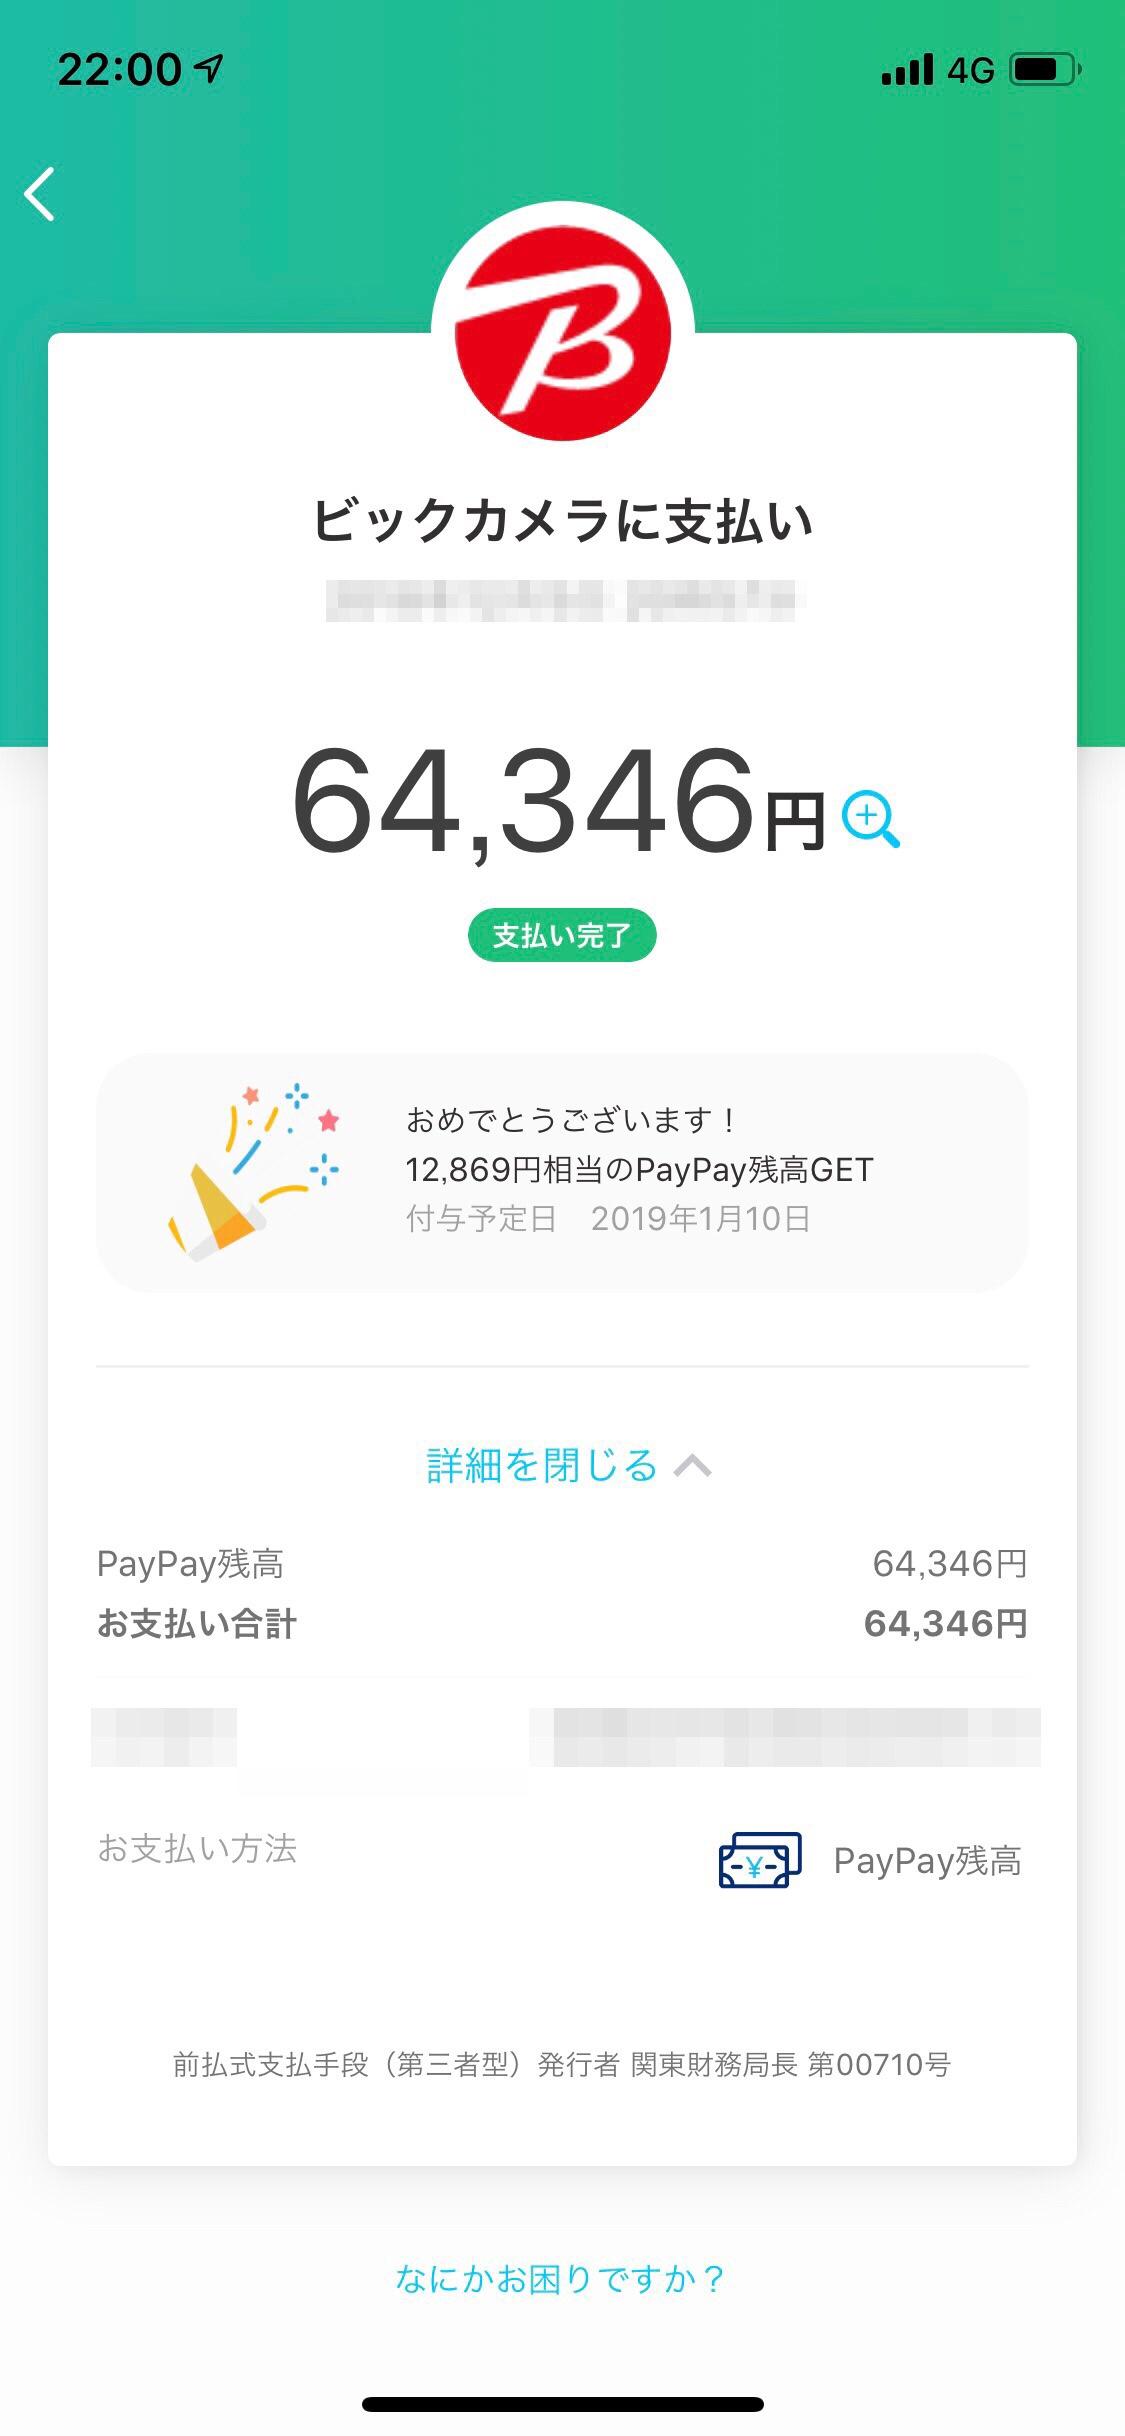 PayPay祭りに便乗してApplewatch4を買ったよ!